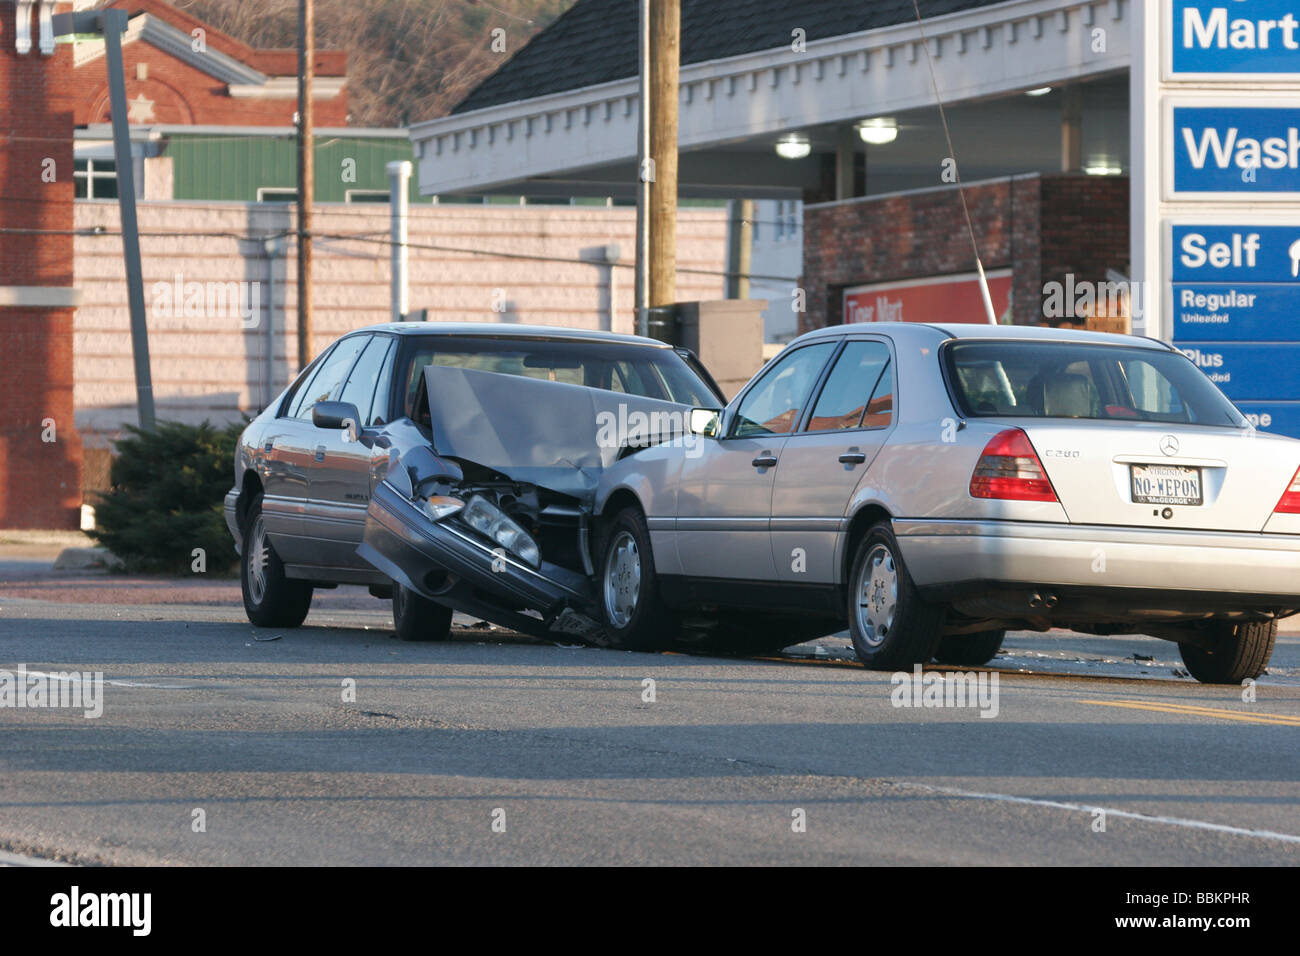 Automobile Crash Stock Photos & Automobile Crash Stock Images - Alamy